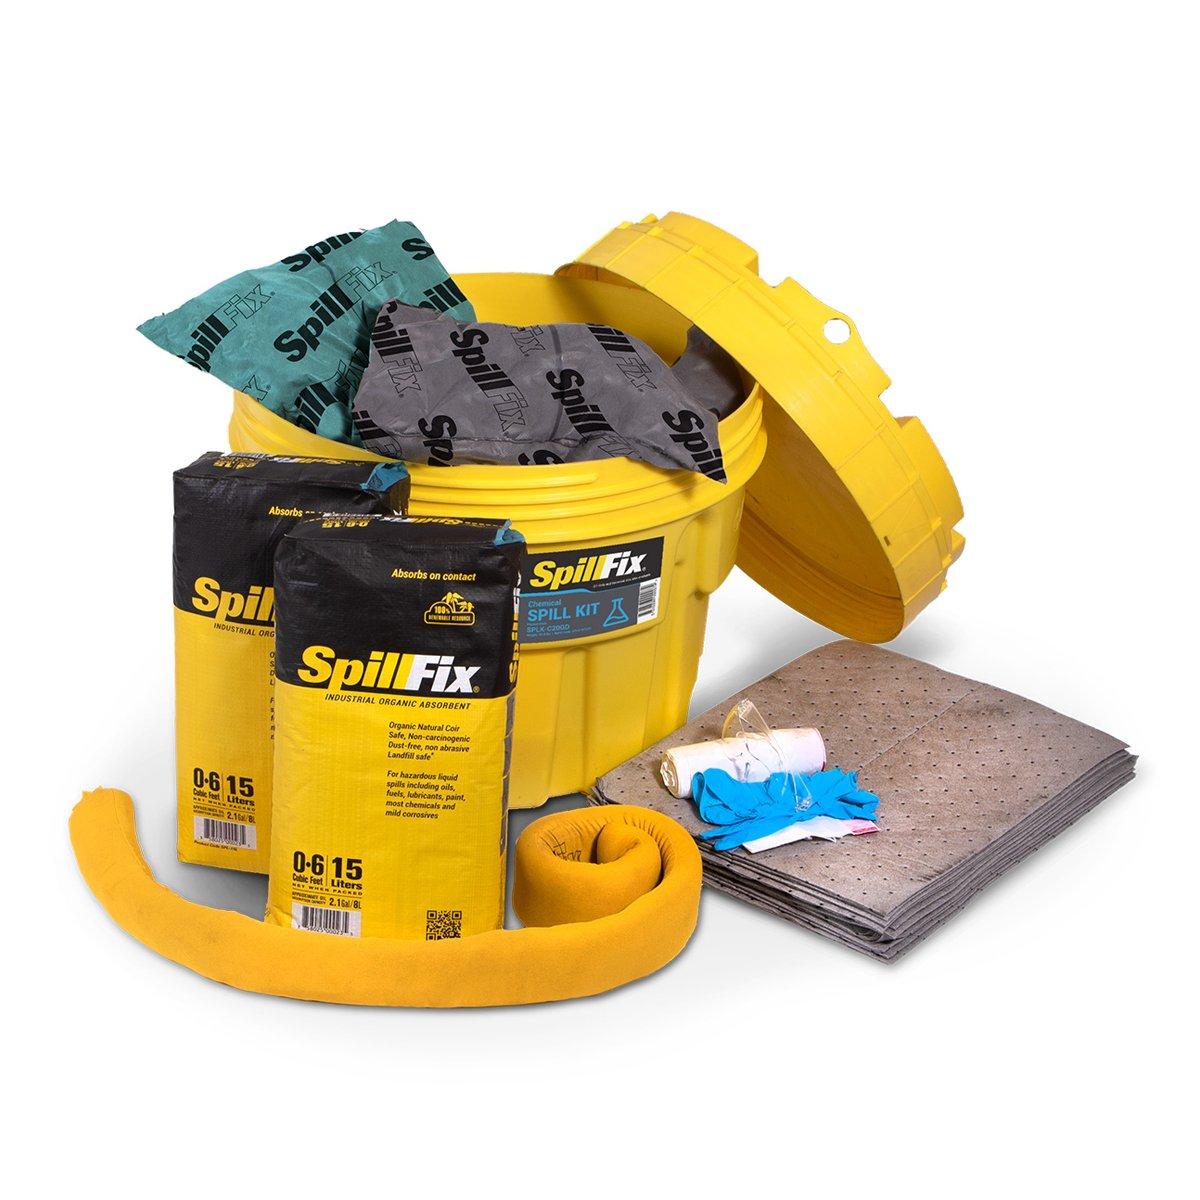 SpillFix HazMat Spill Kit in 20 Gallon Overpack Salvage Drum